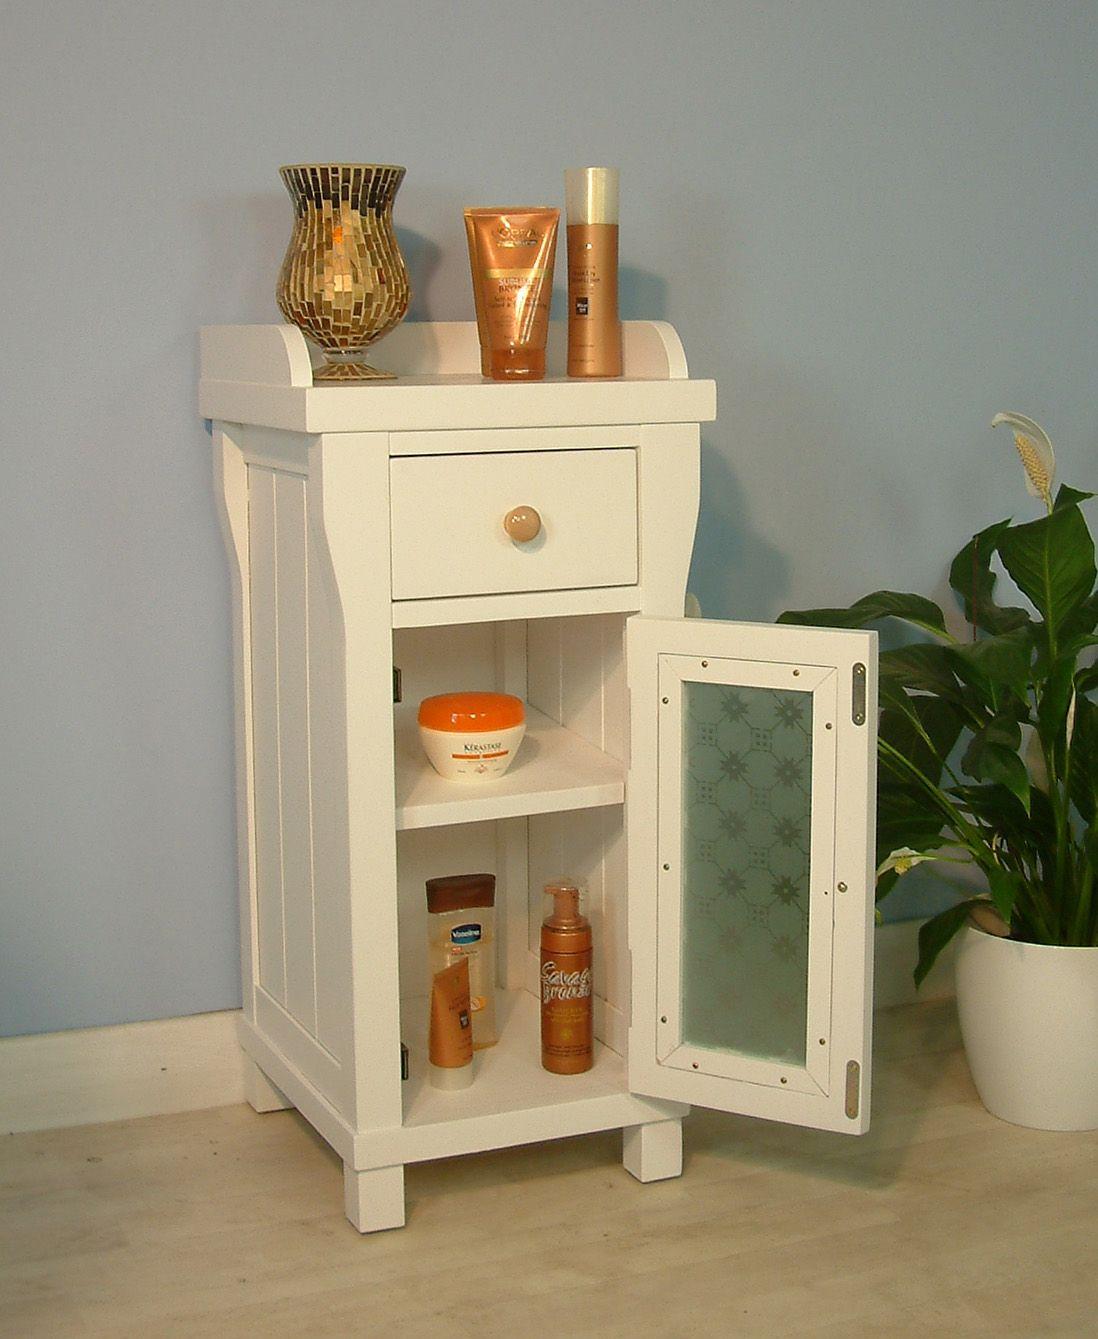 Image Gallery Website bathroom floor cabinet ideas